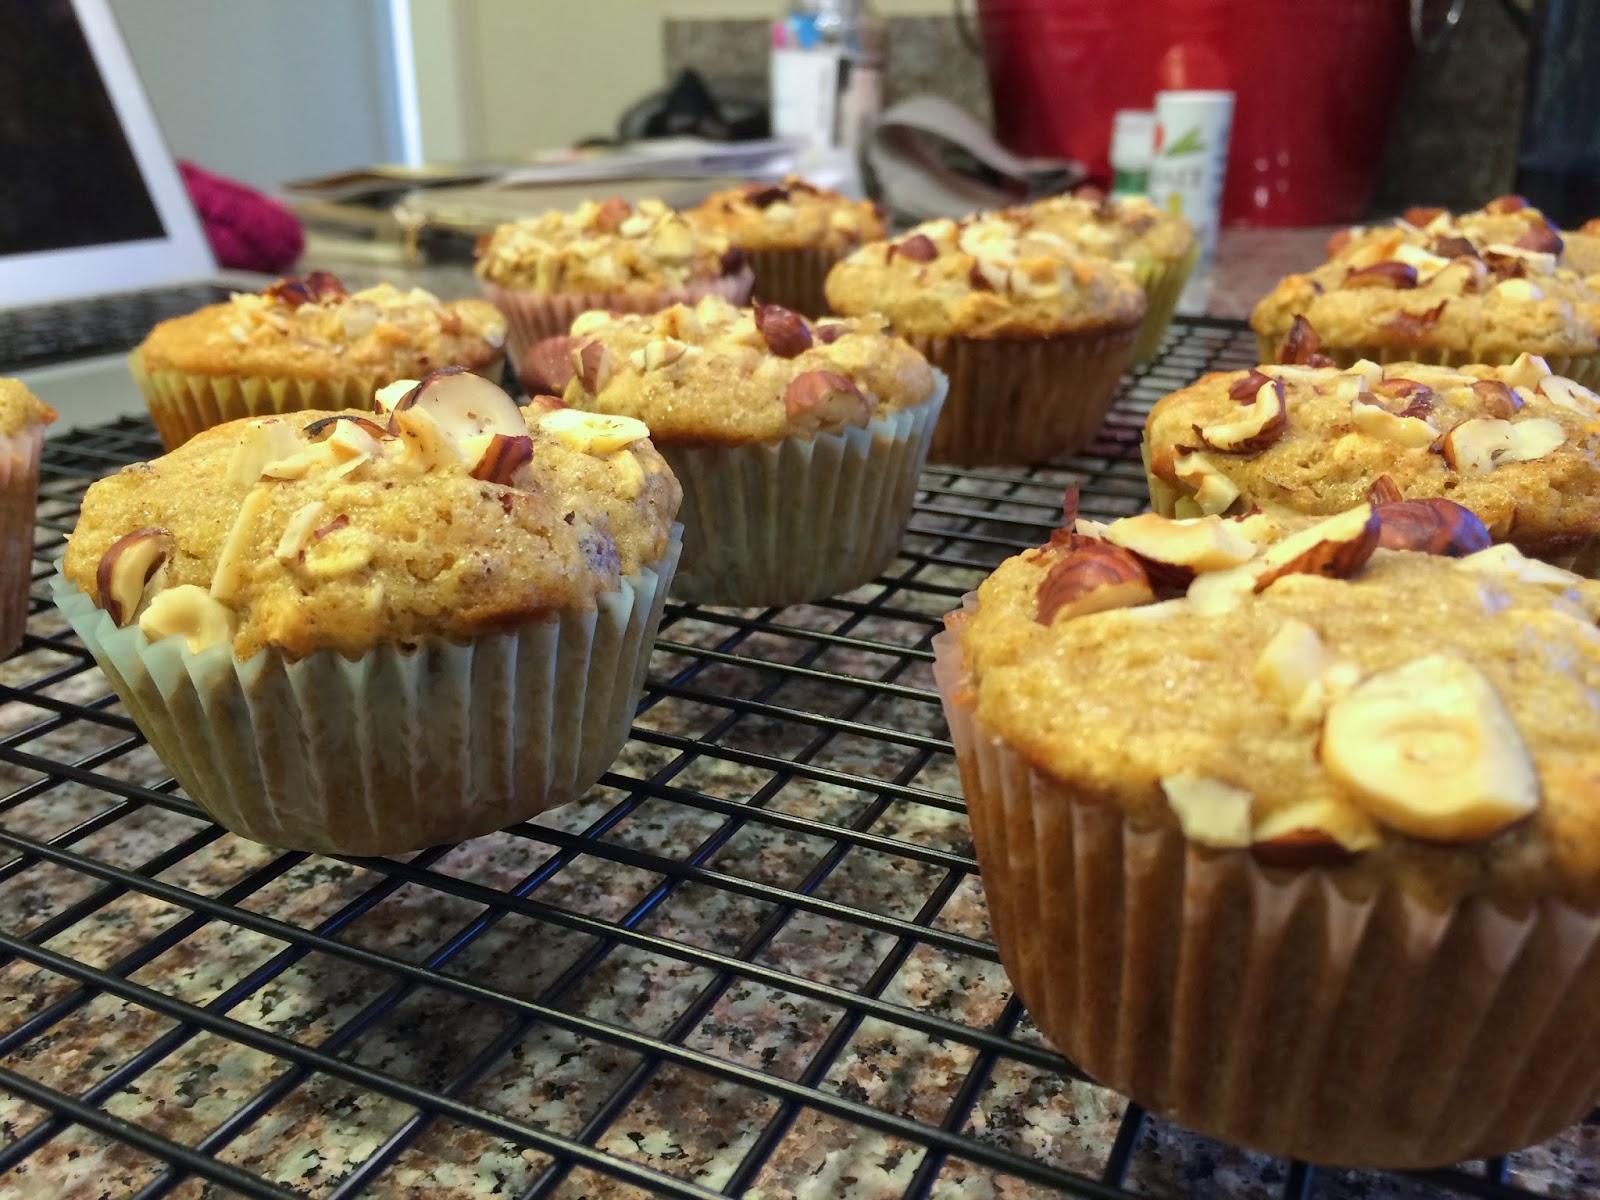 Princess Baker: Pear & Hazelnut Muffins